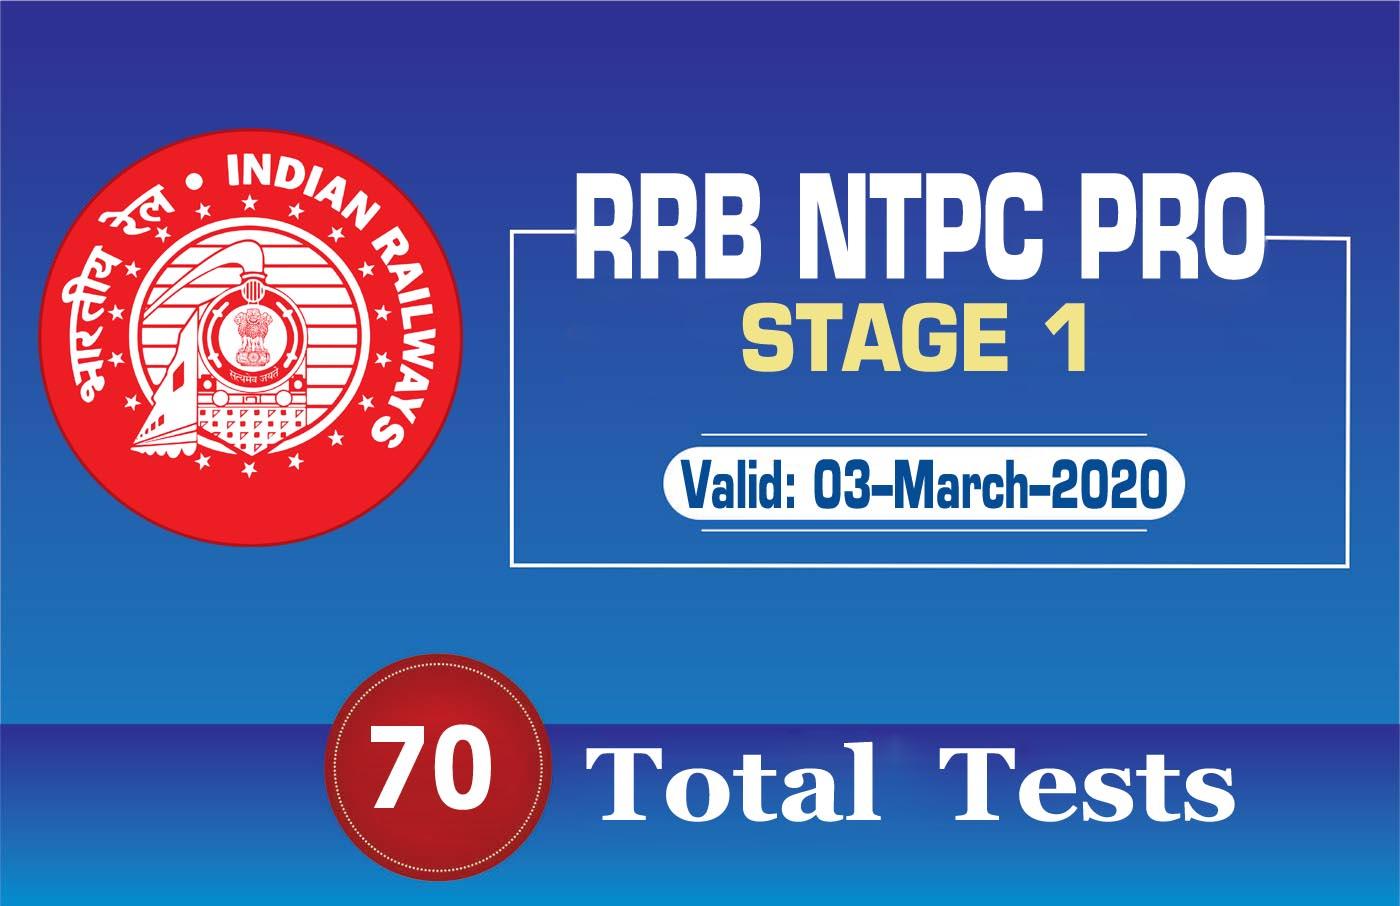 RRB NTPC 2019 PRO